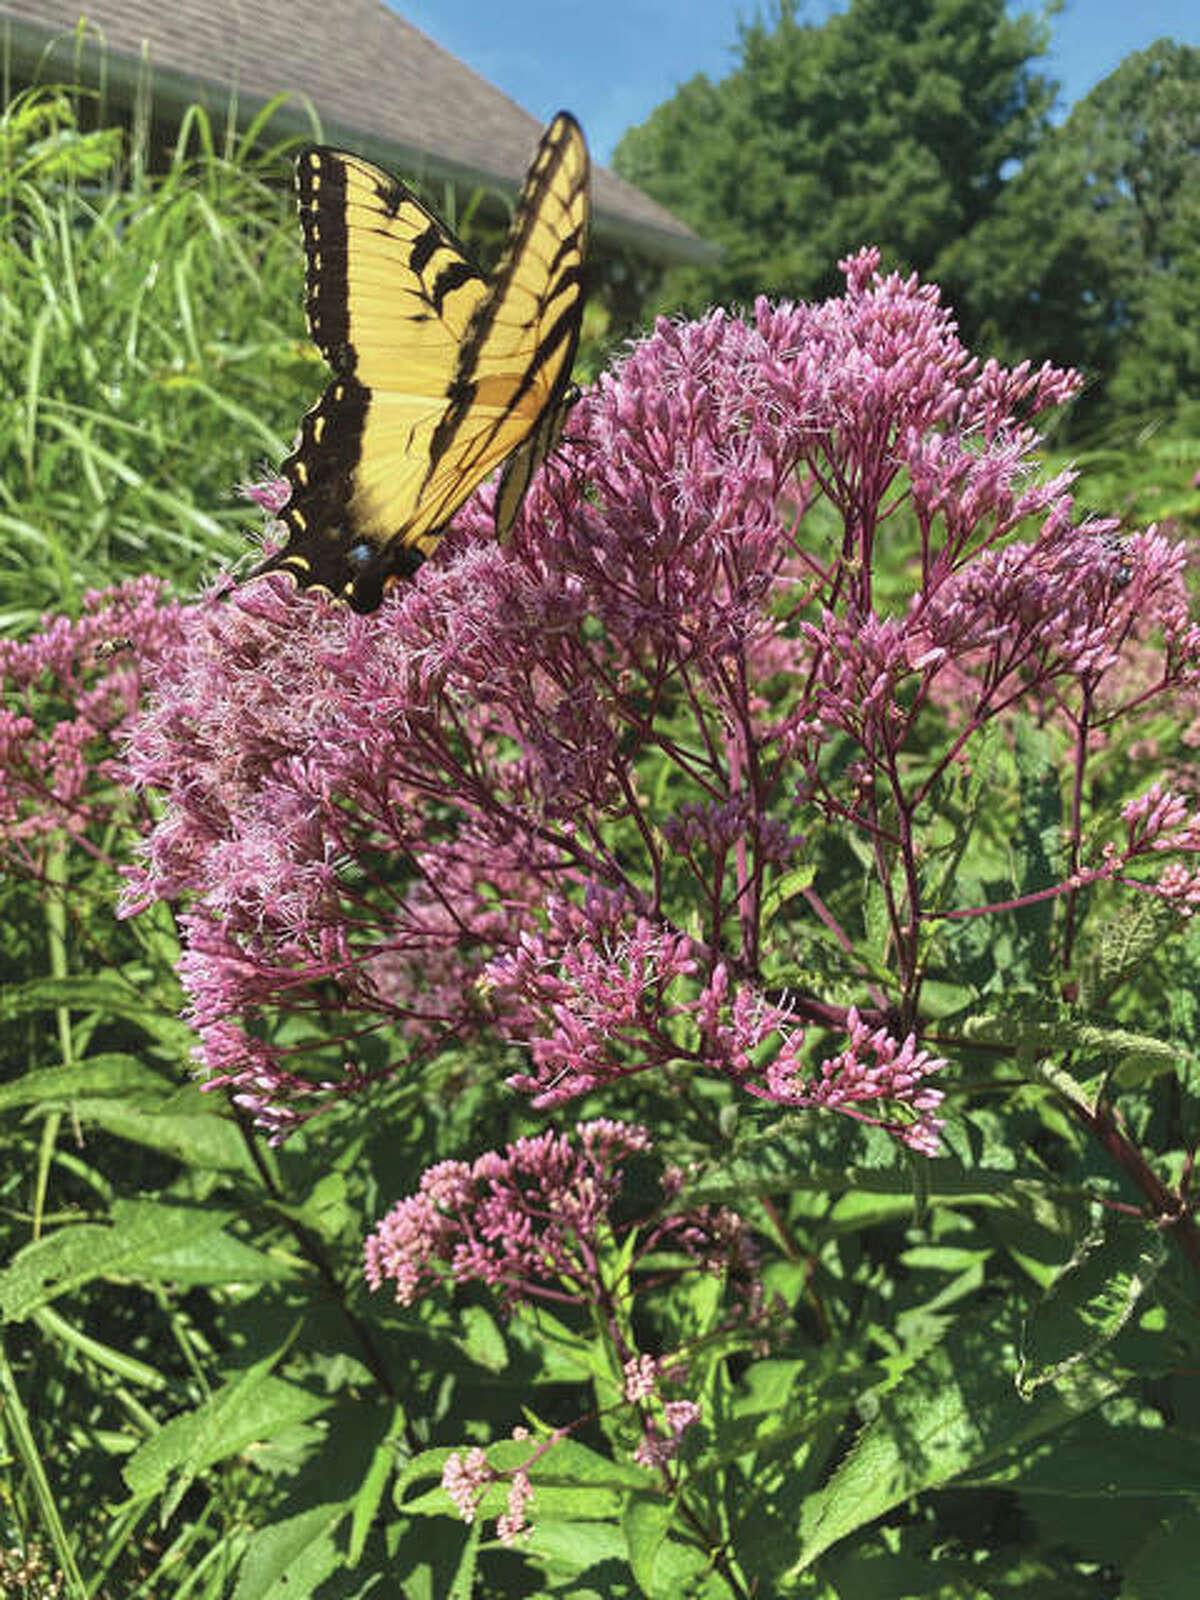 A butterfly lands on Joe-Pye weed in rural Roodhouse.